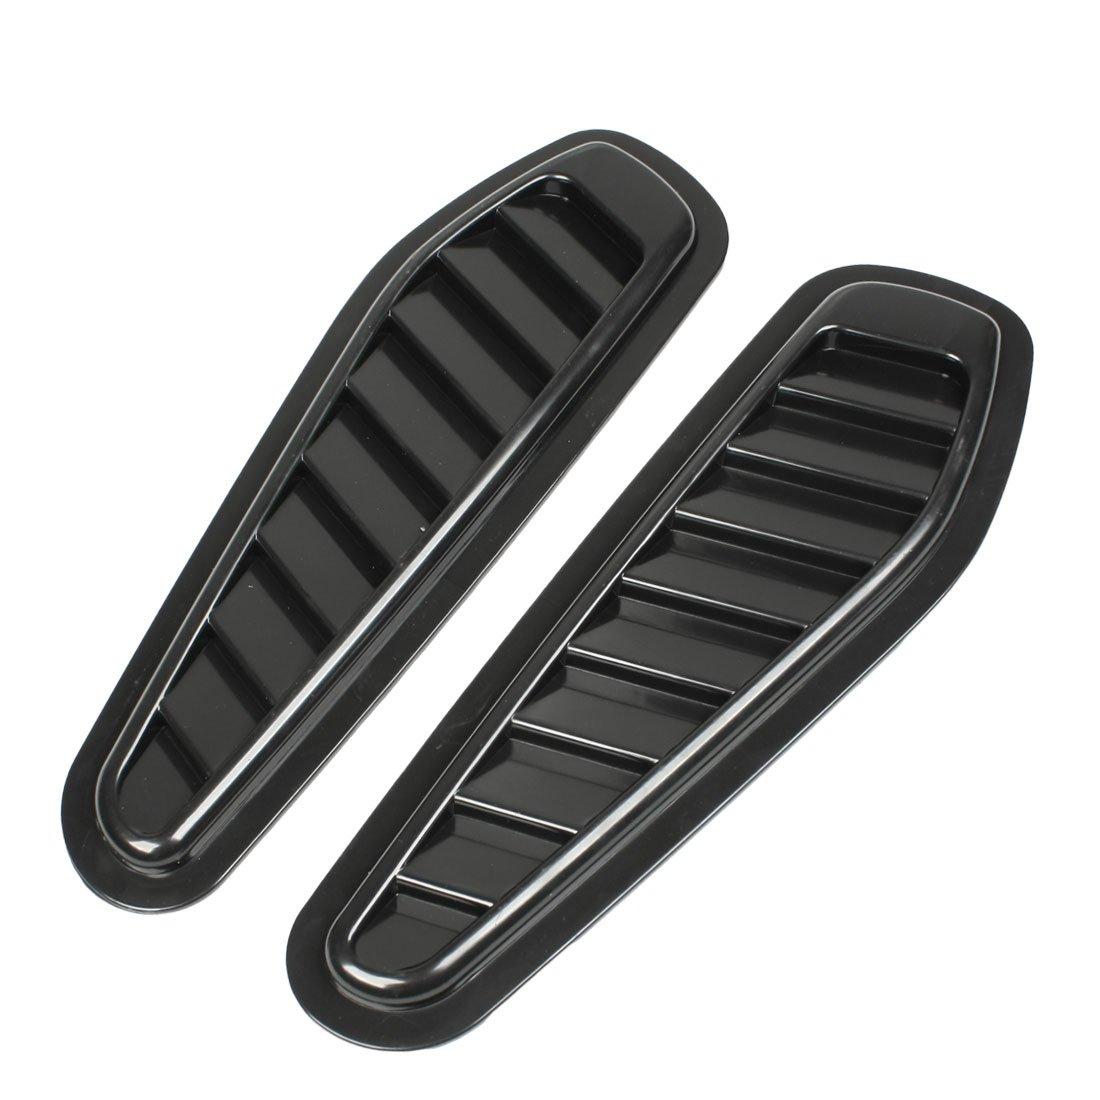 sourcingmap® Fahrzeug Auto Side Lüftungs Fender Deck Aufkleber Dekoration Schwarz 2 Stück sourcing map a13010200ux0205